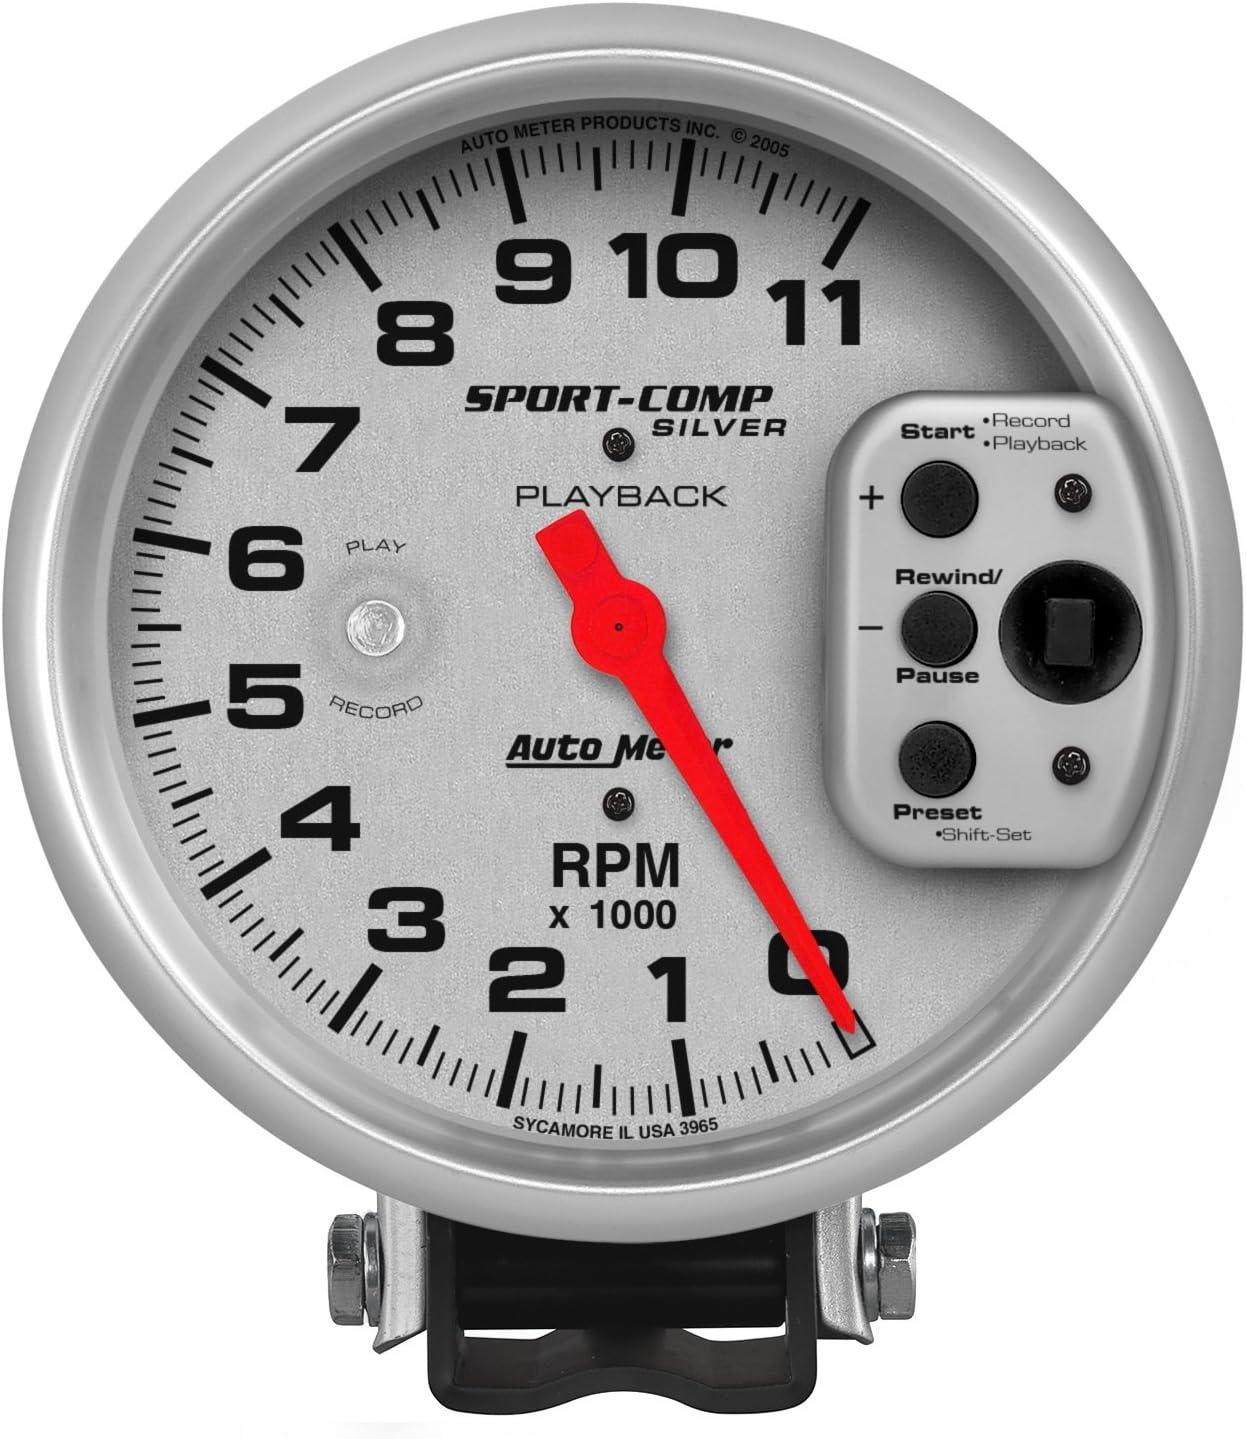 Auto Meter 35% OFF 3965 Sport-Comp Regular store Silver Playback Tachometer